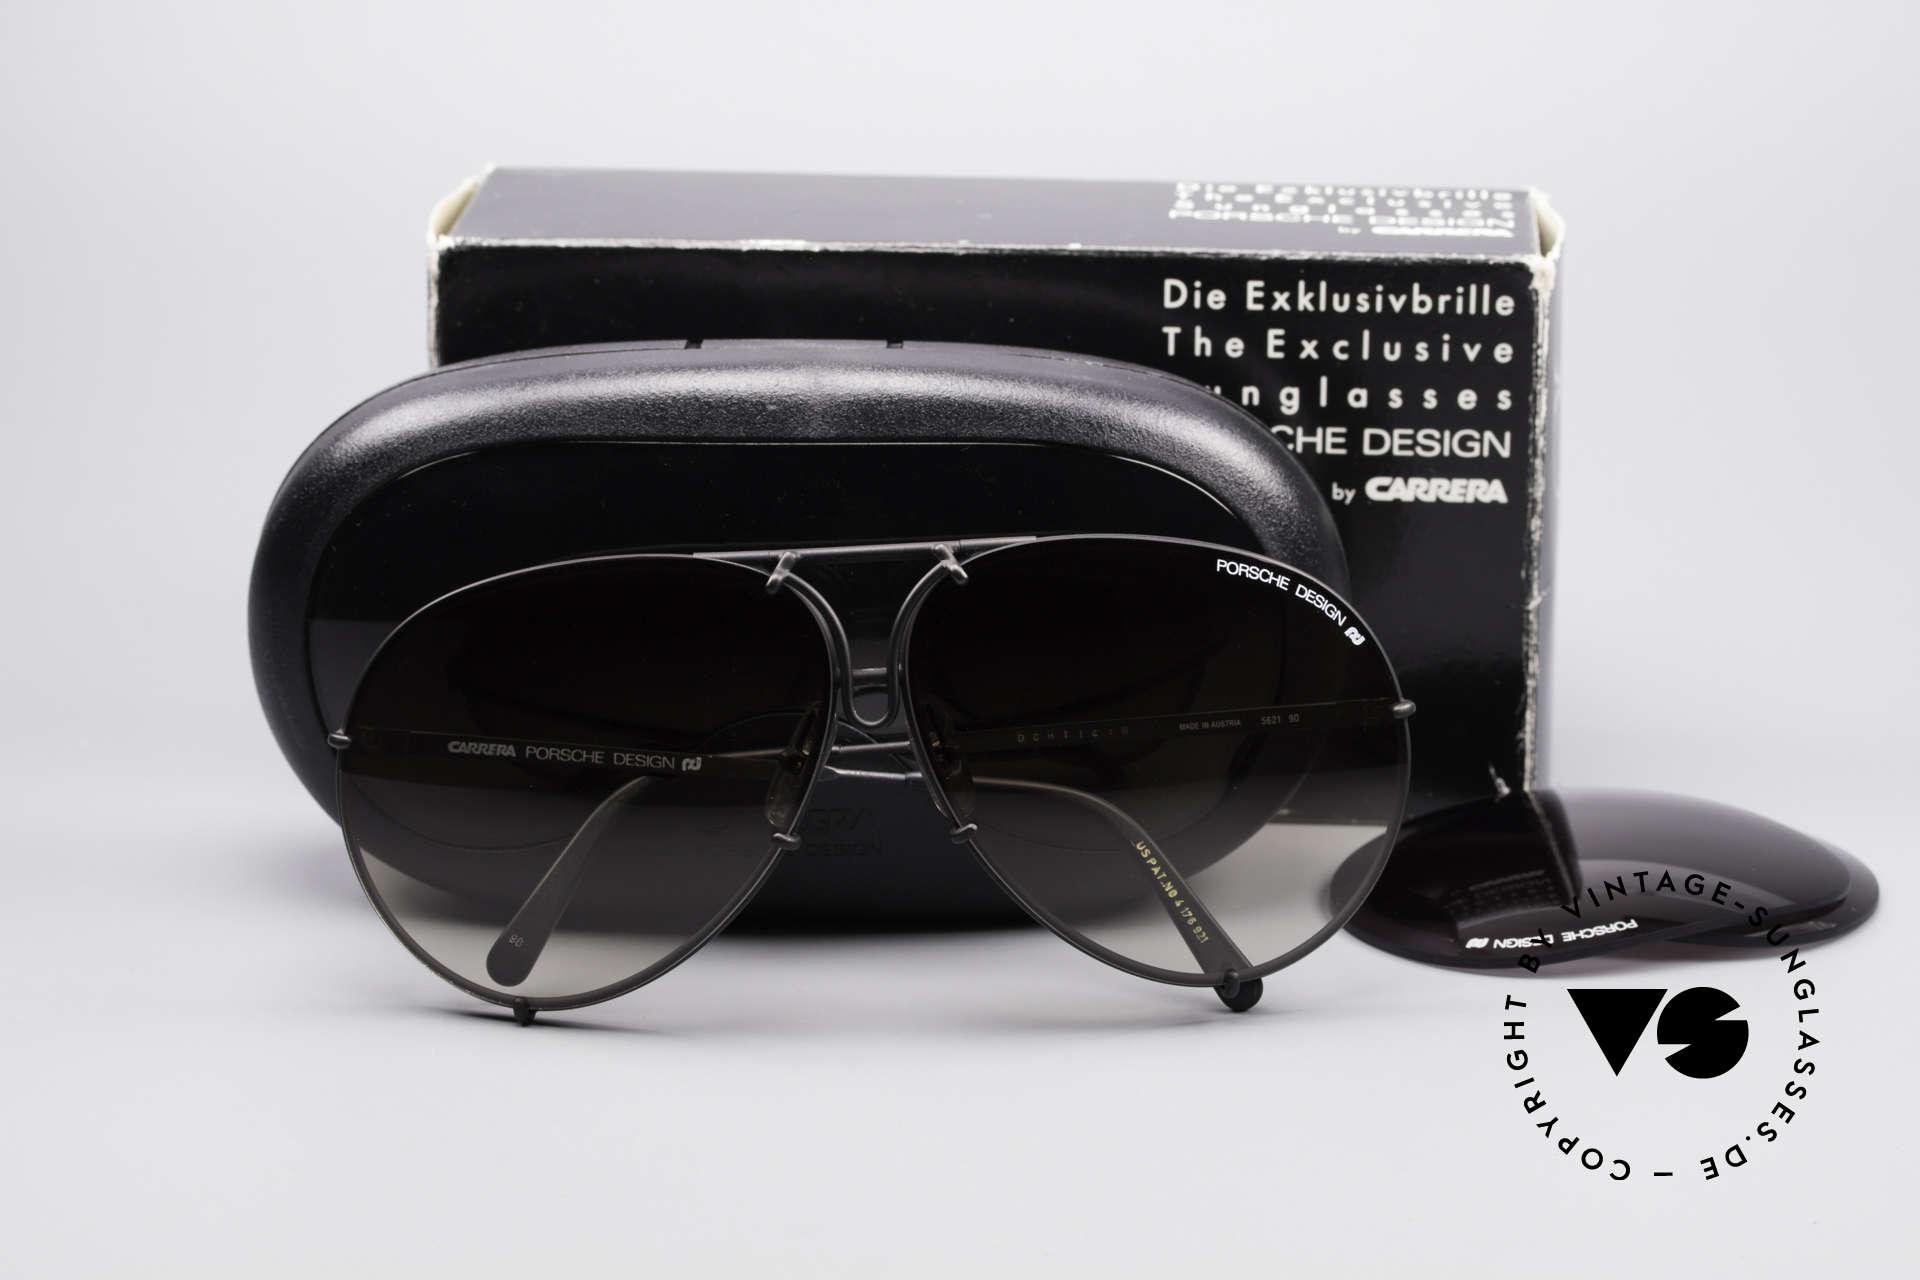 083c03bc04 Sunglasses Porsche 5621 Large 80 s Aviator Shades